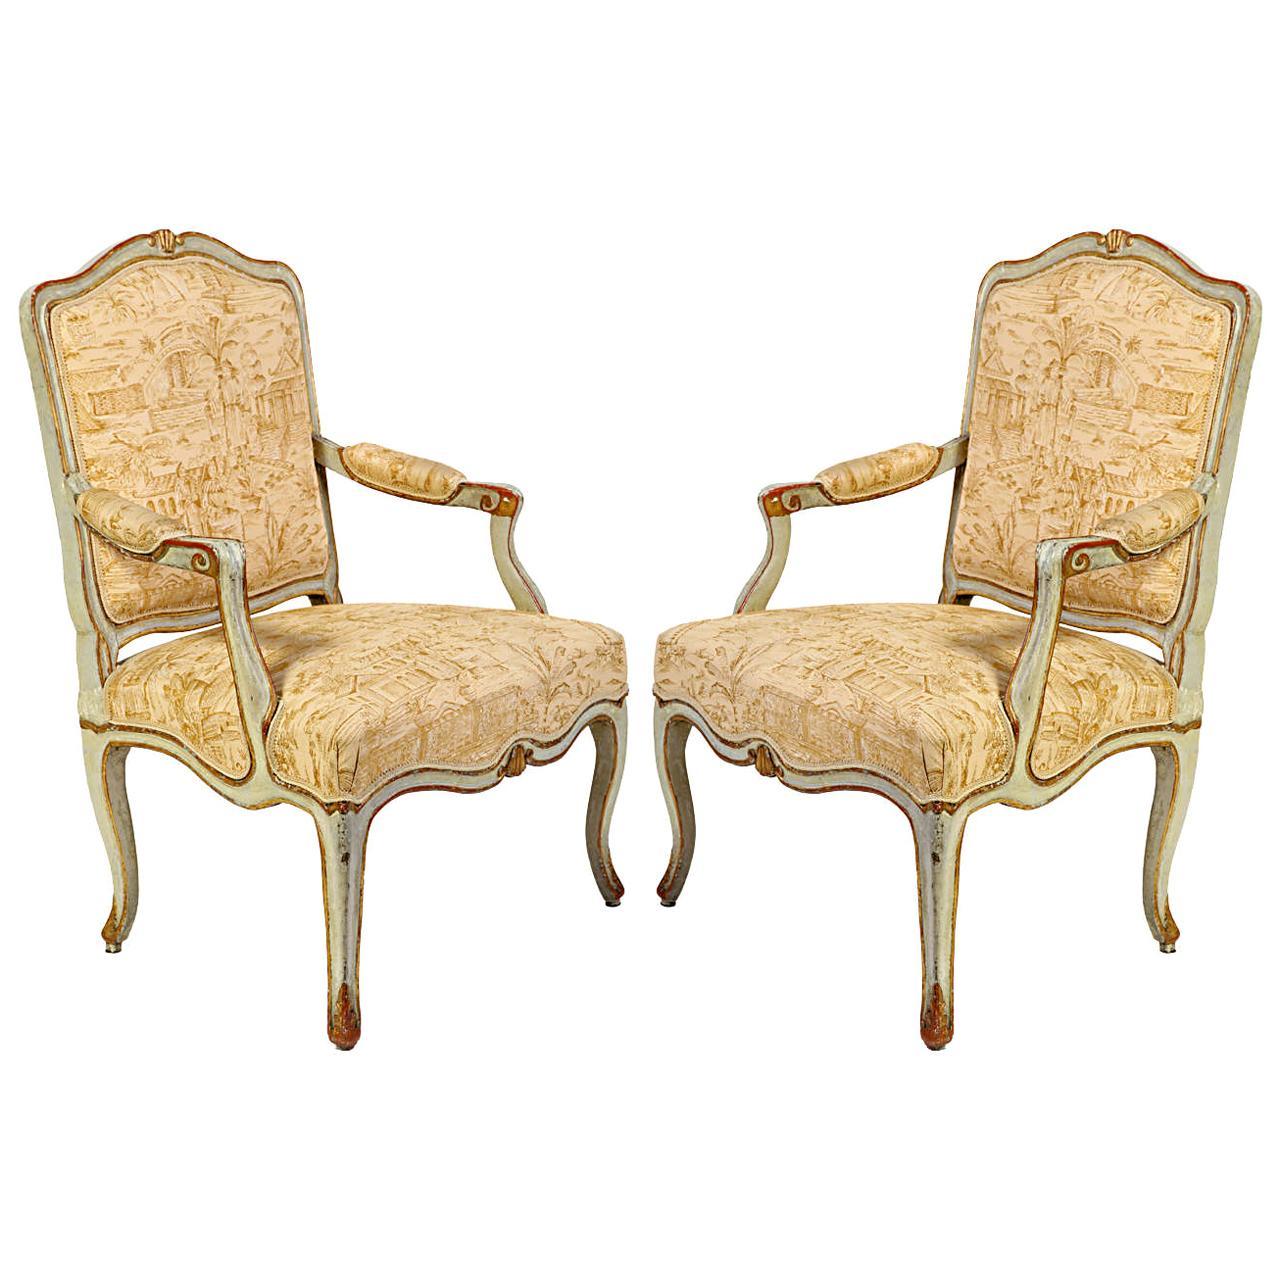 Pair of Italian 18th Century Painted Armchairs